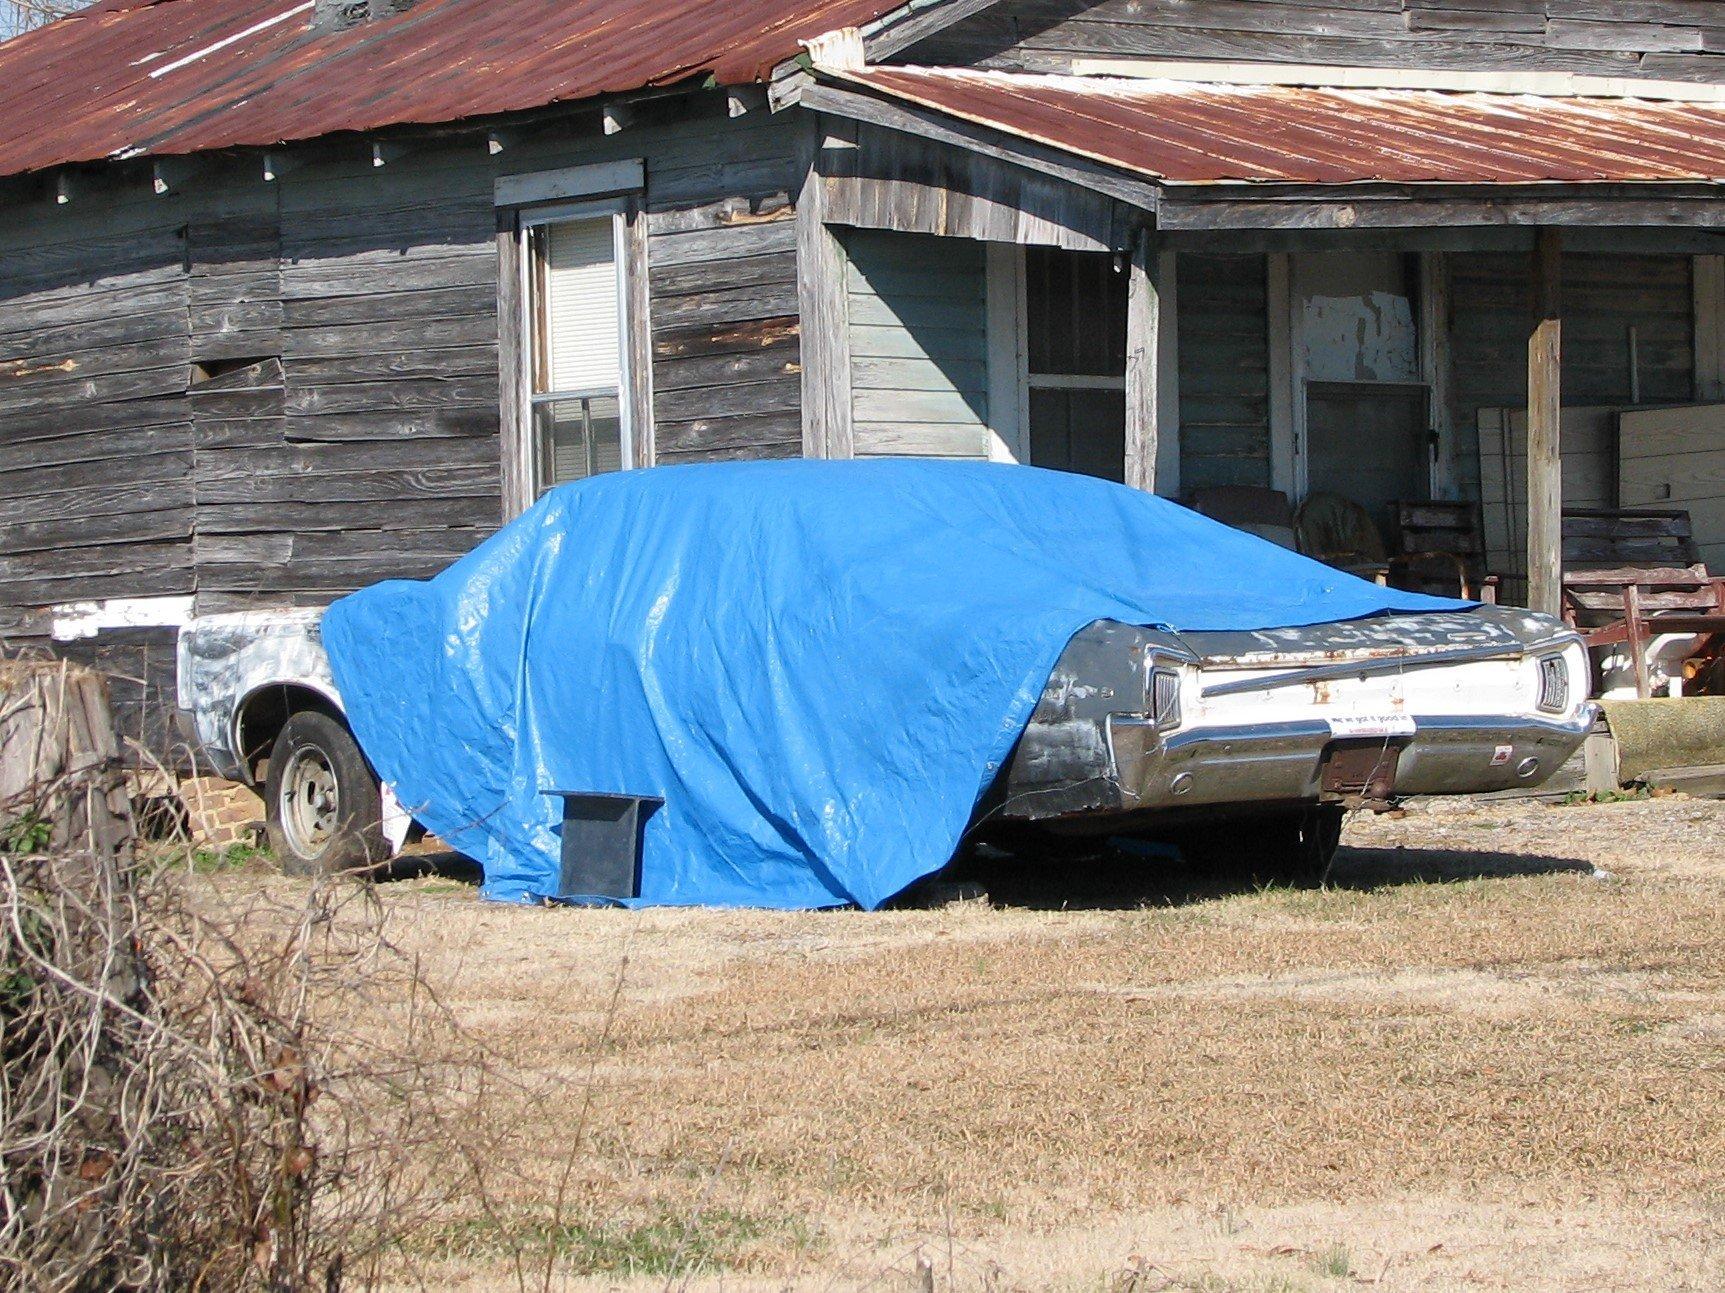 Image of a car under a blue tarpaulin